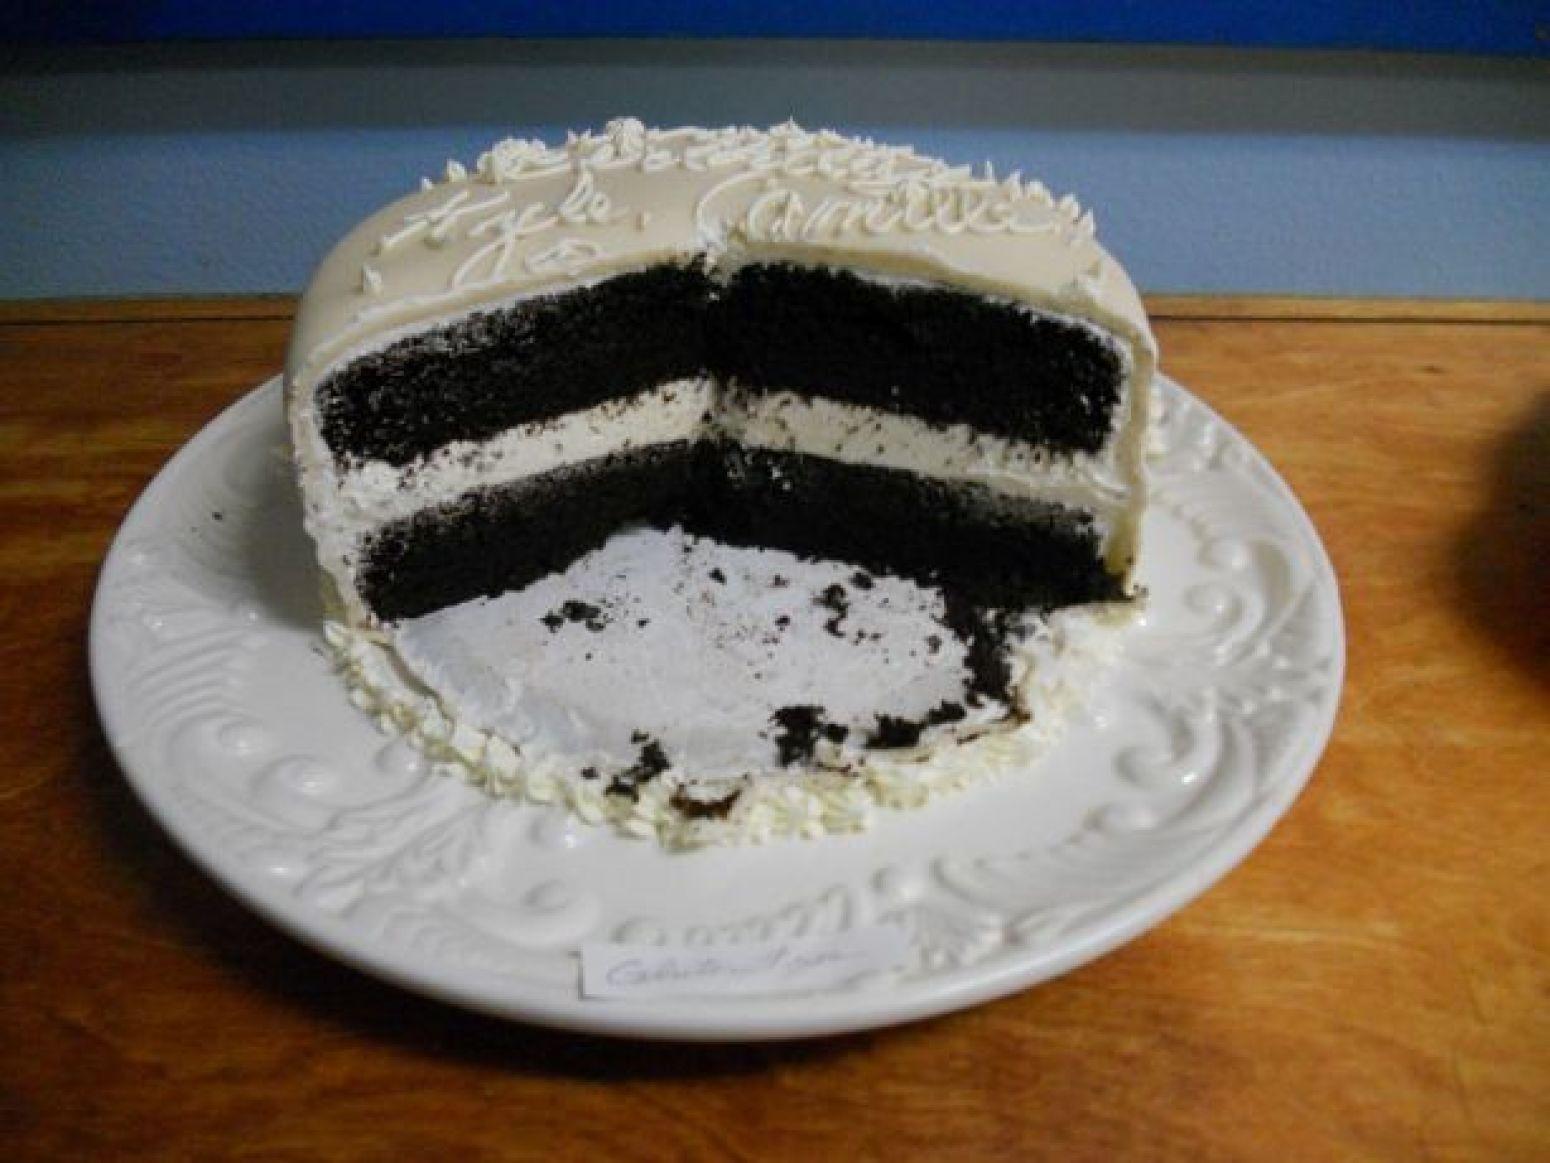 Hershey's Perfectly Chocolate Chocolate Cake Recipe 6   Just A Pinch ...